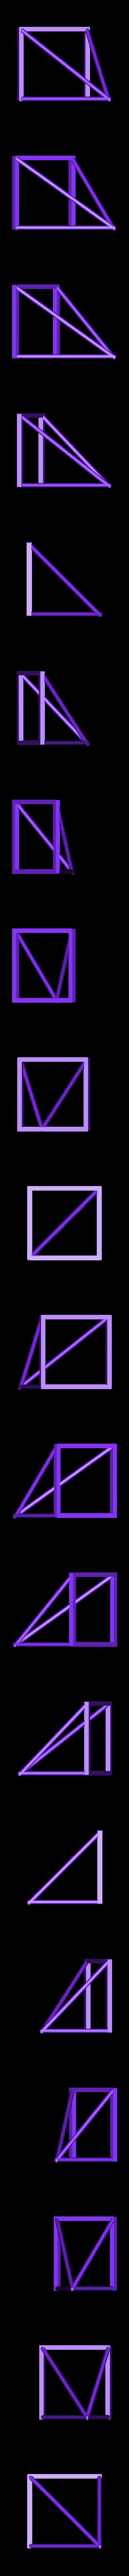 LiuThirdOutline.stl Download free STL file Thirds Cube Dissection, Many Styles, Liu Hui • 3D printer template, LGBU